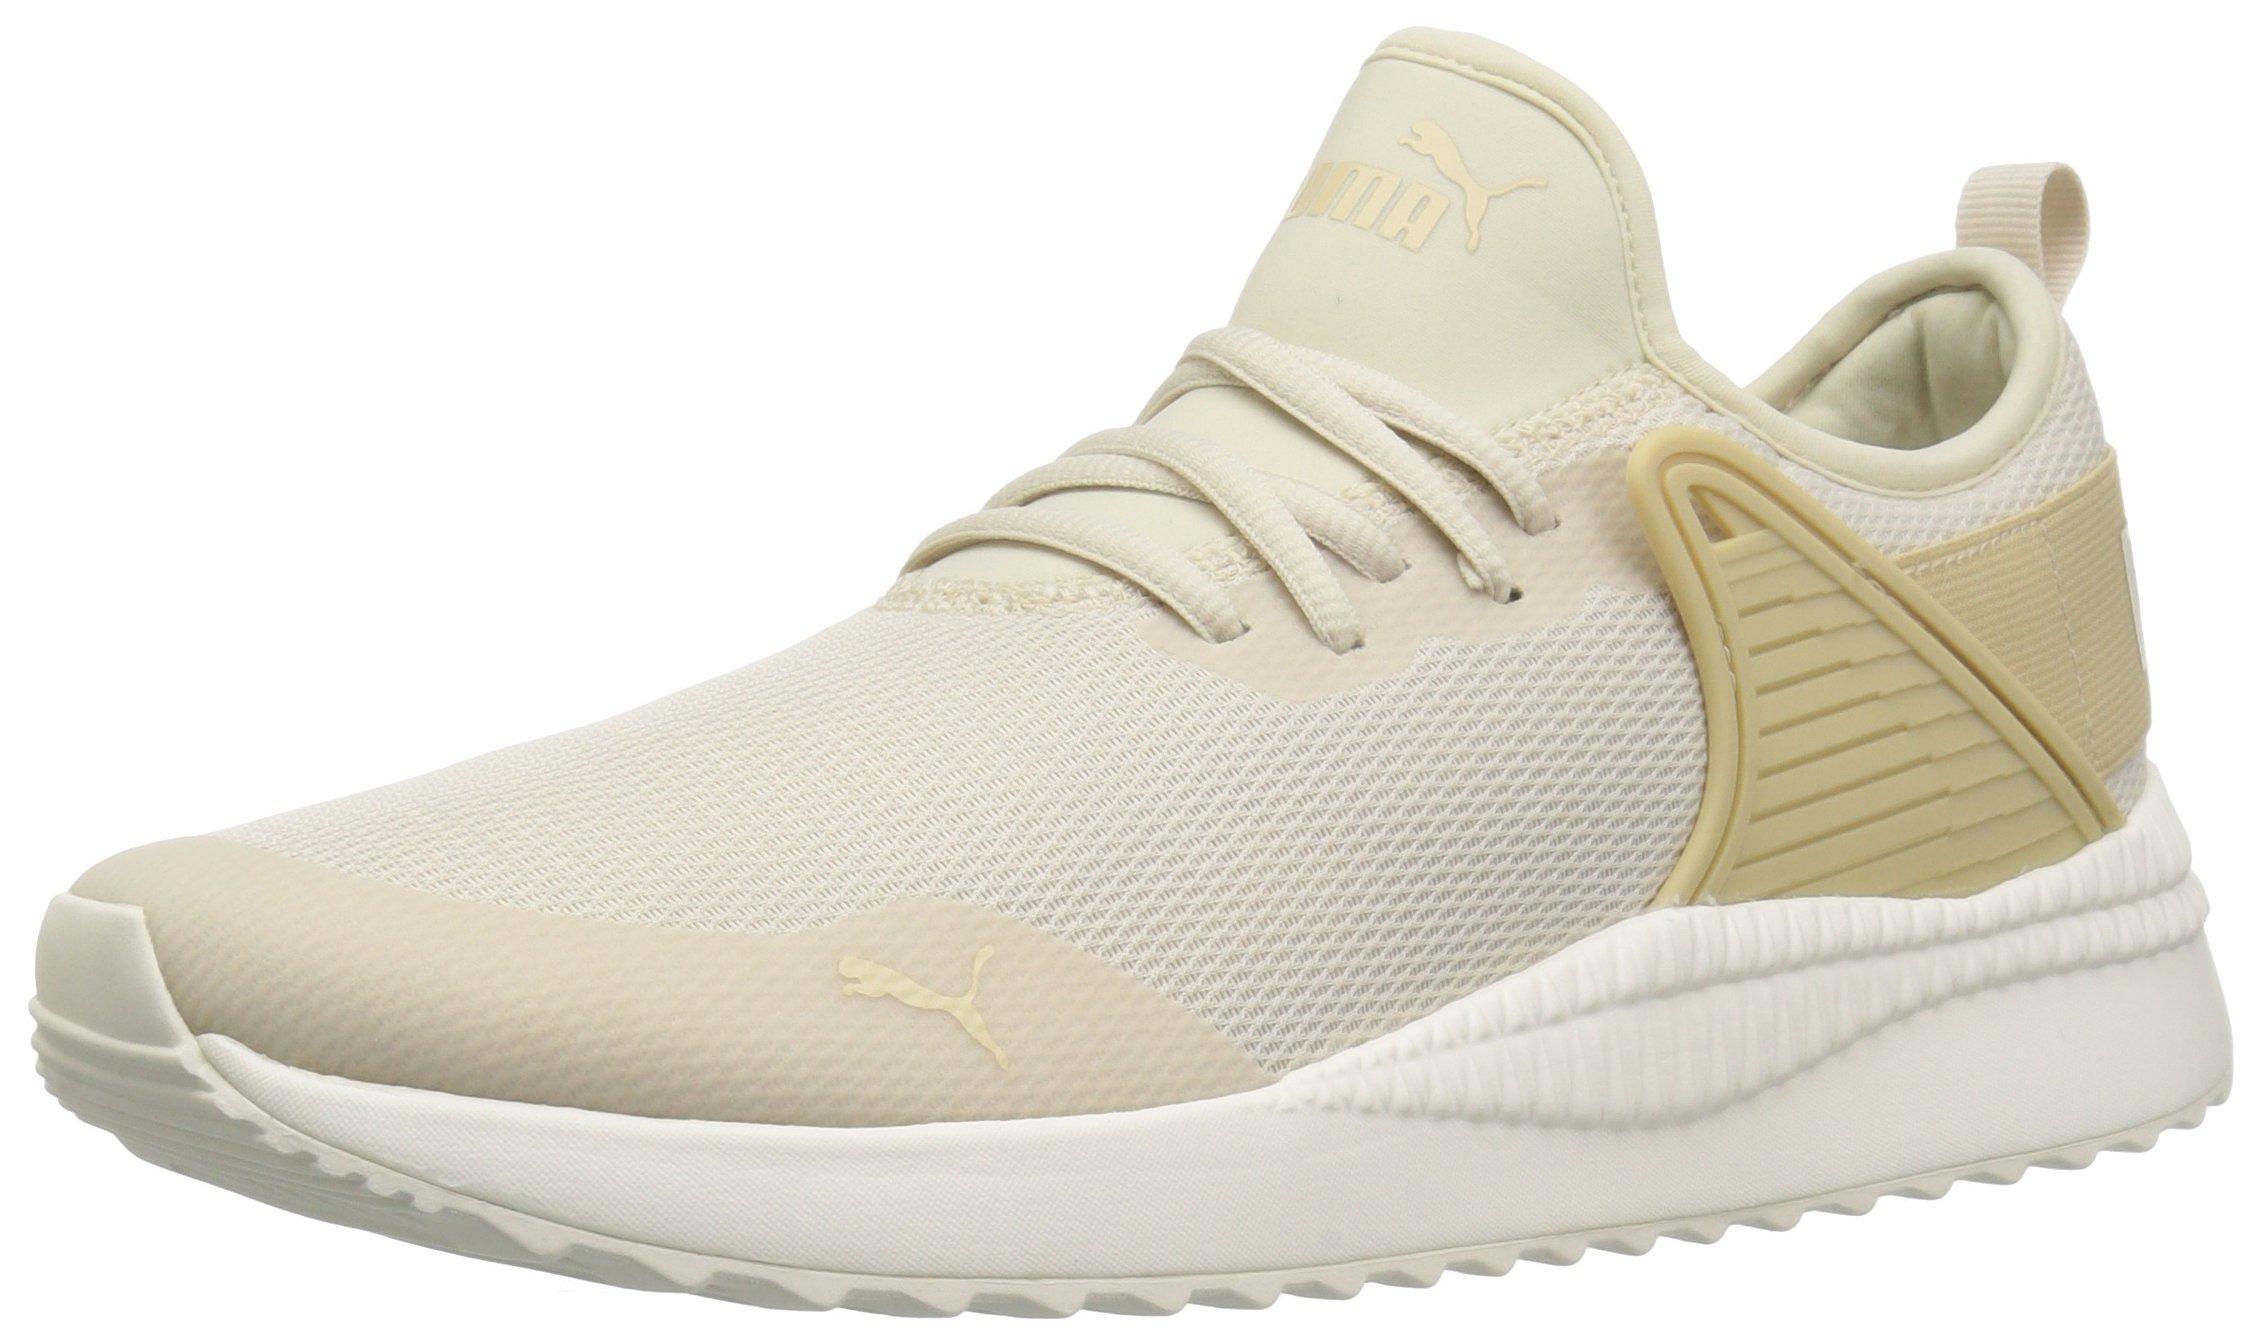 PUMA Men's Pacer Next Cage Sneaker- Buy